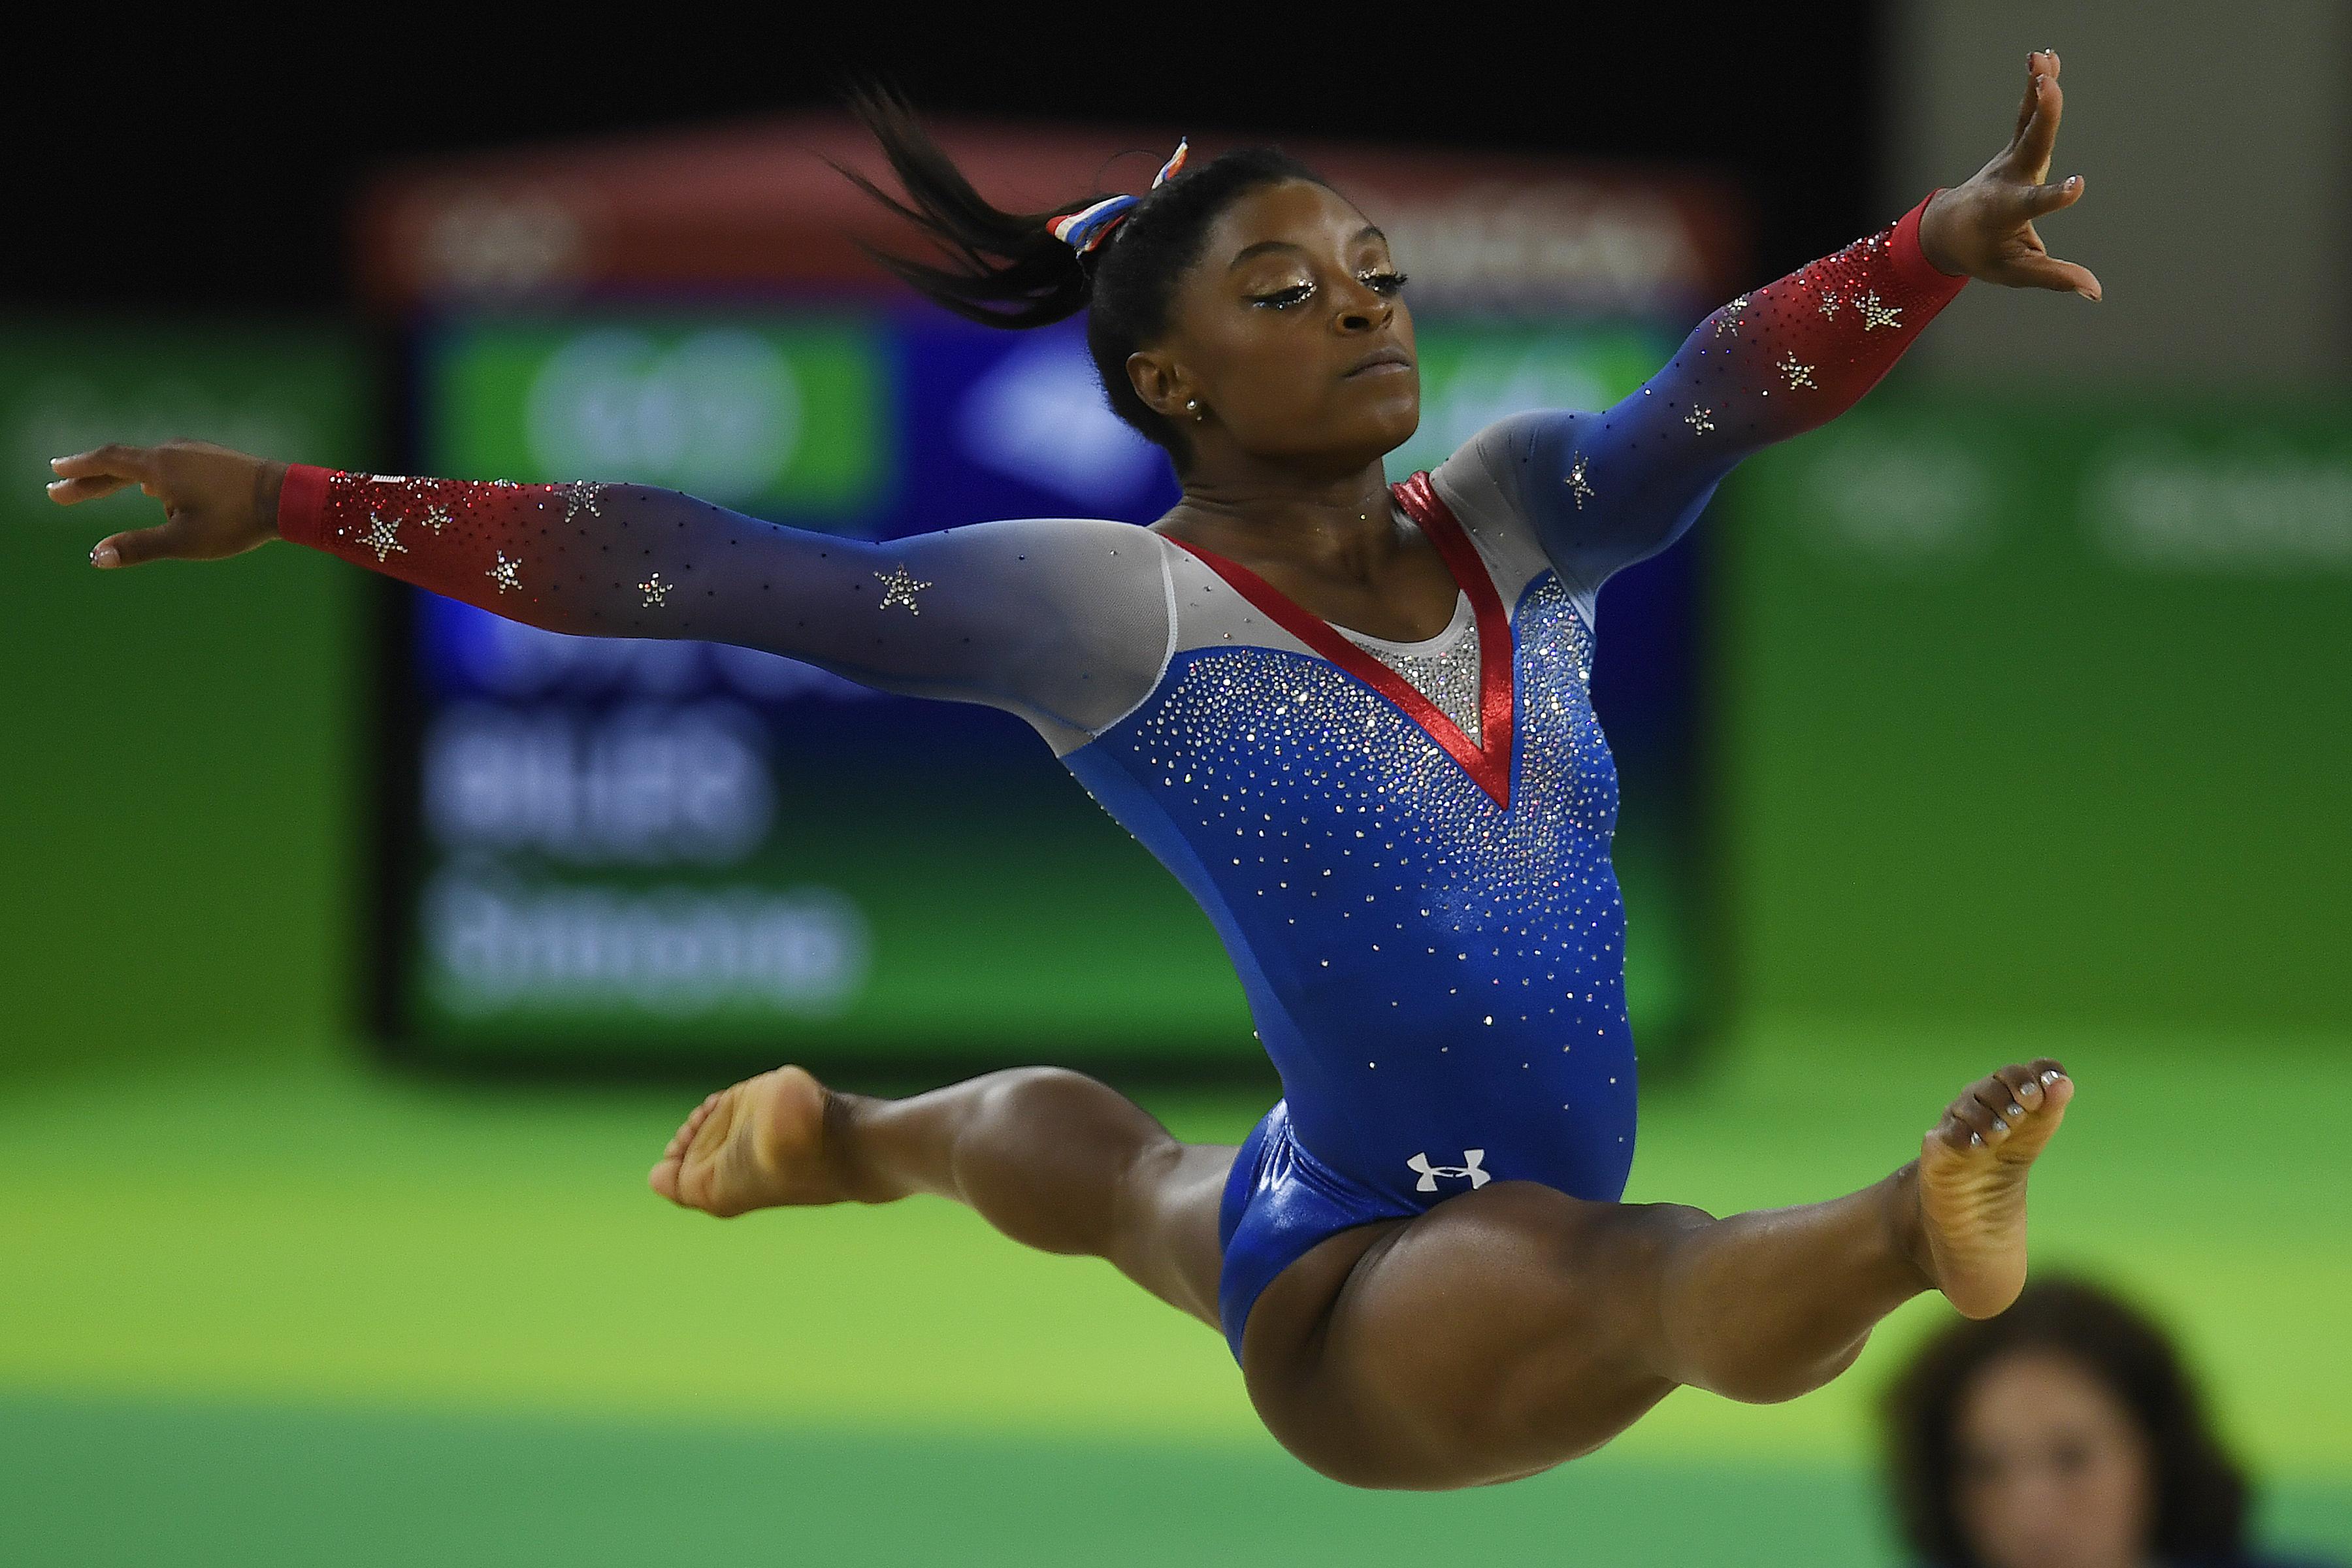 Rio 2016 floor exercise